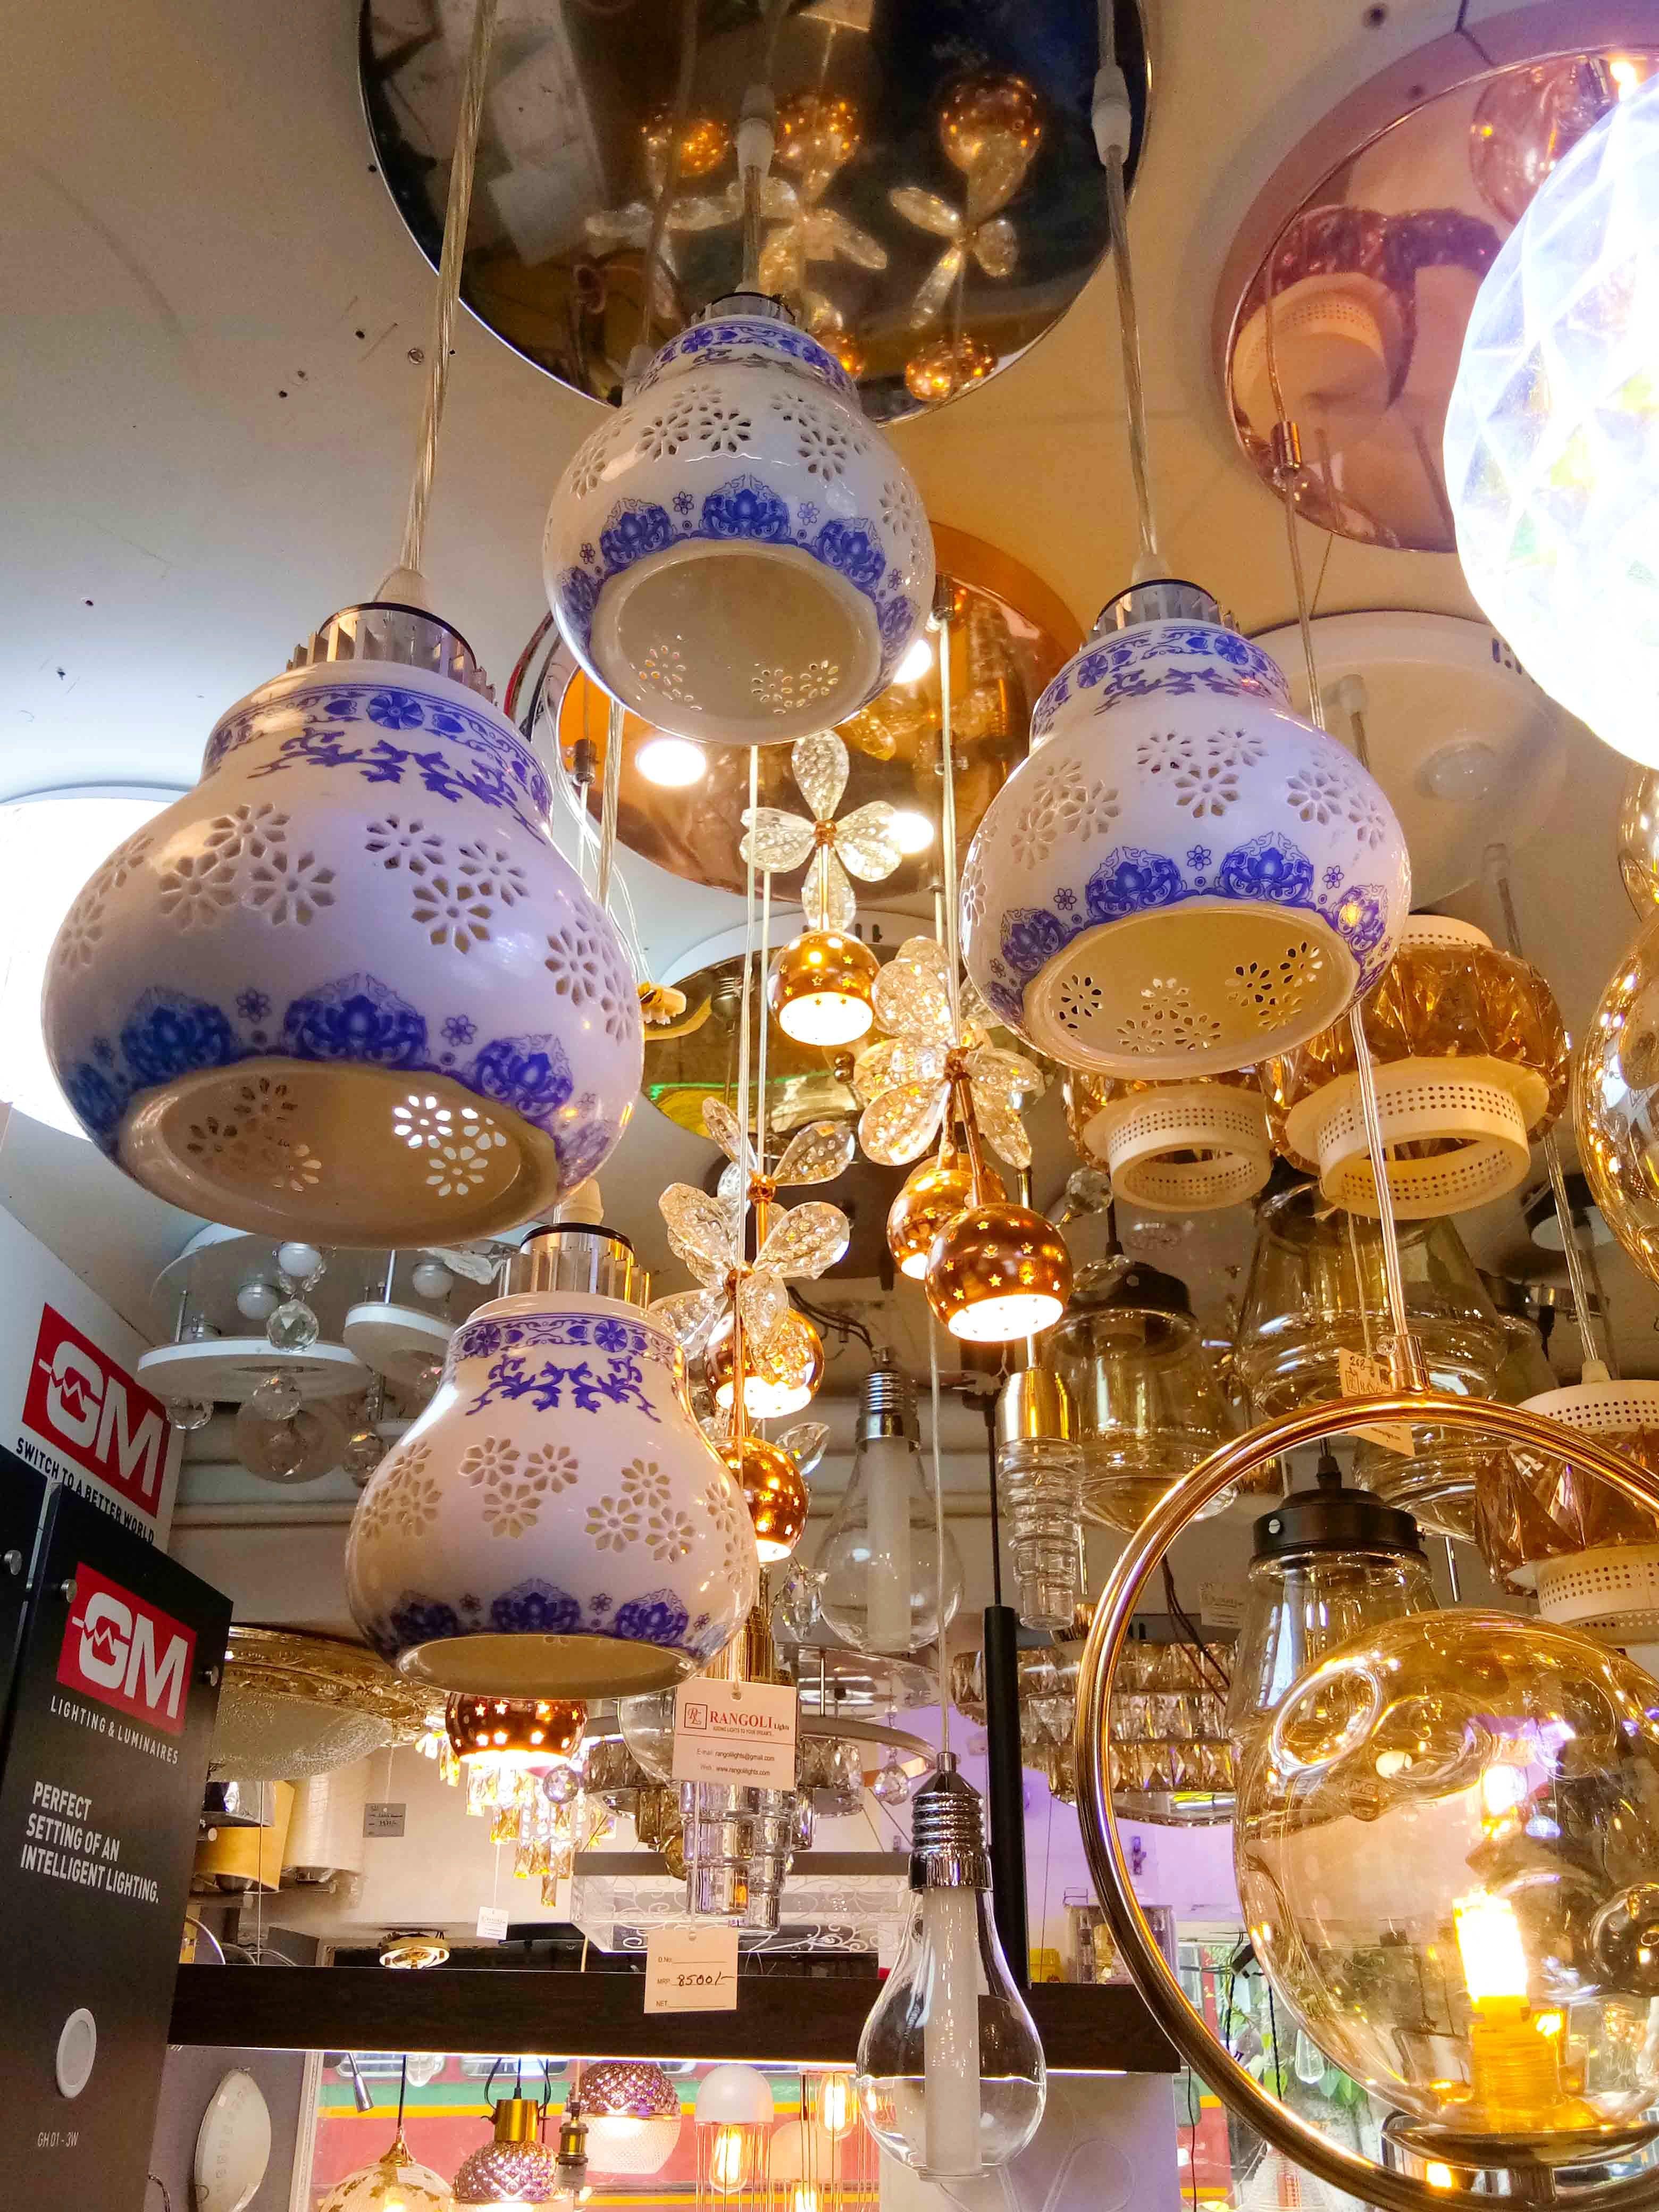 Lighting,Lighting accessory,Light fixture,Chandelier,City,Interior design,Ceiling,Market,Lamp,Porcelain